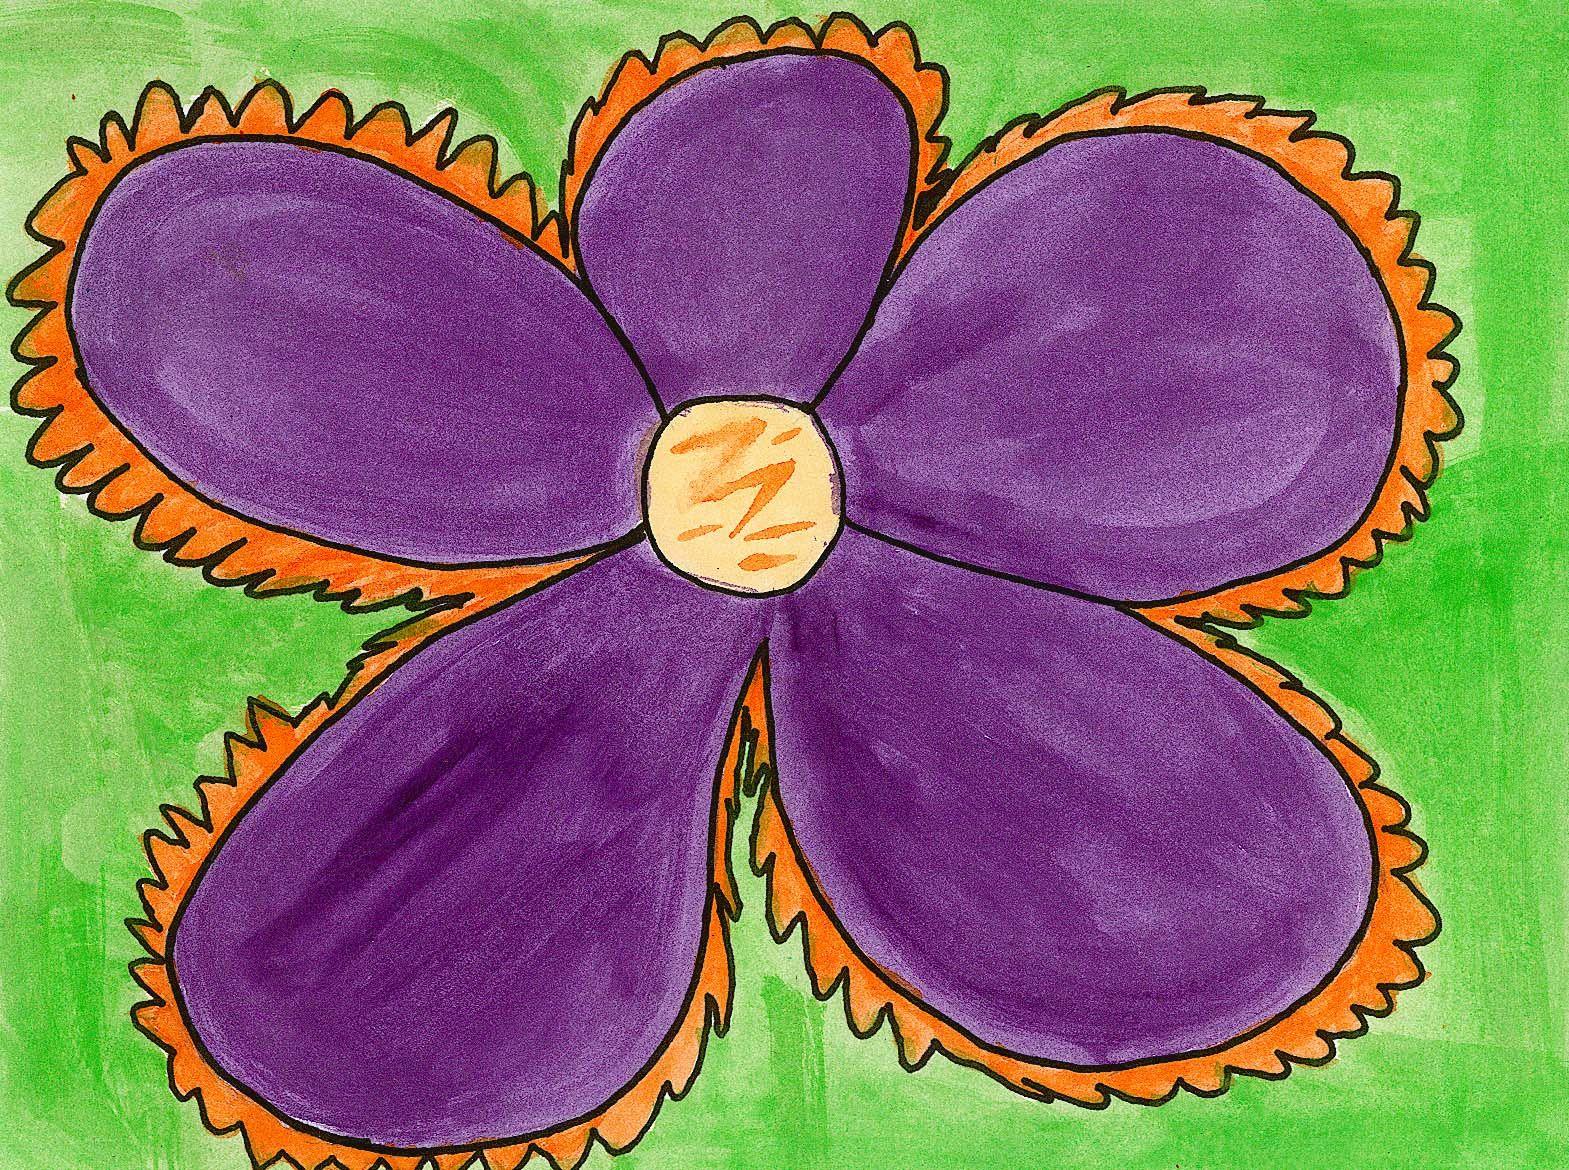 flowers elementary school montgomery alabama